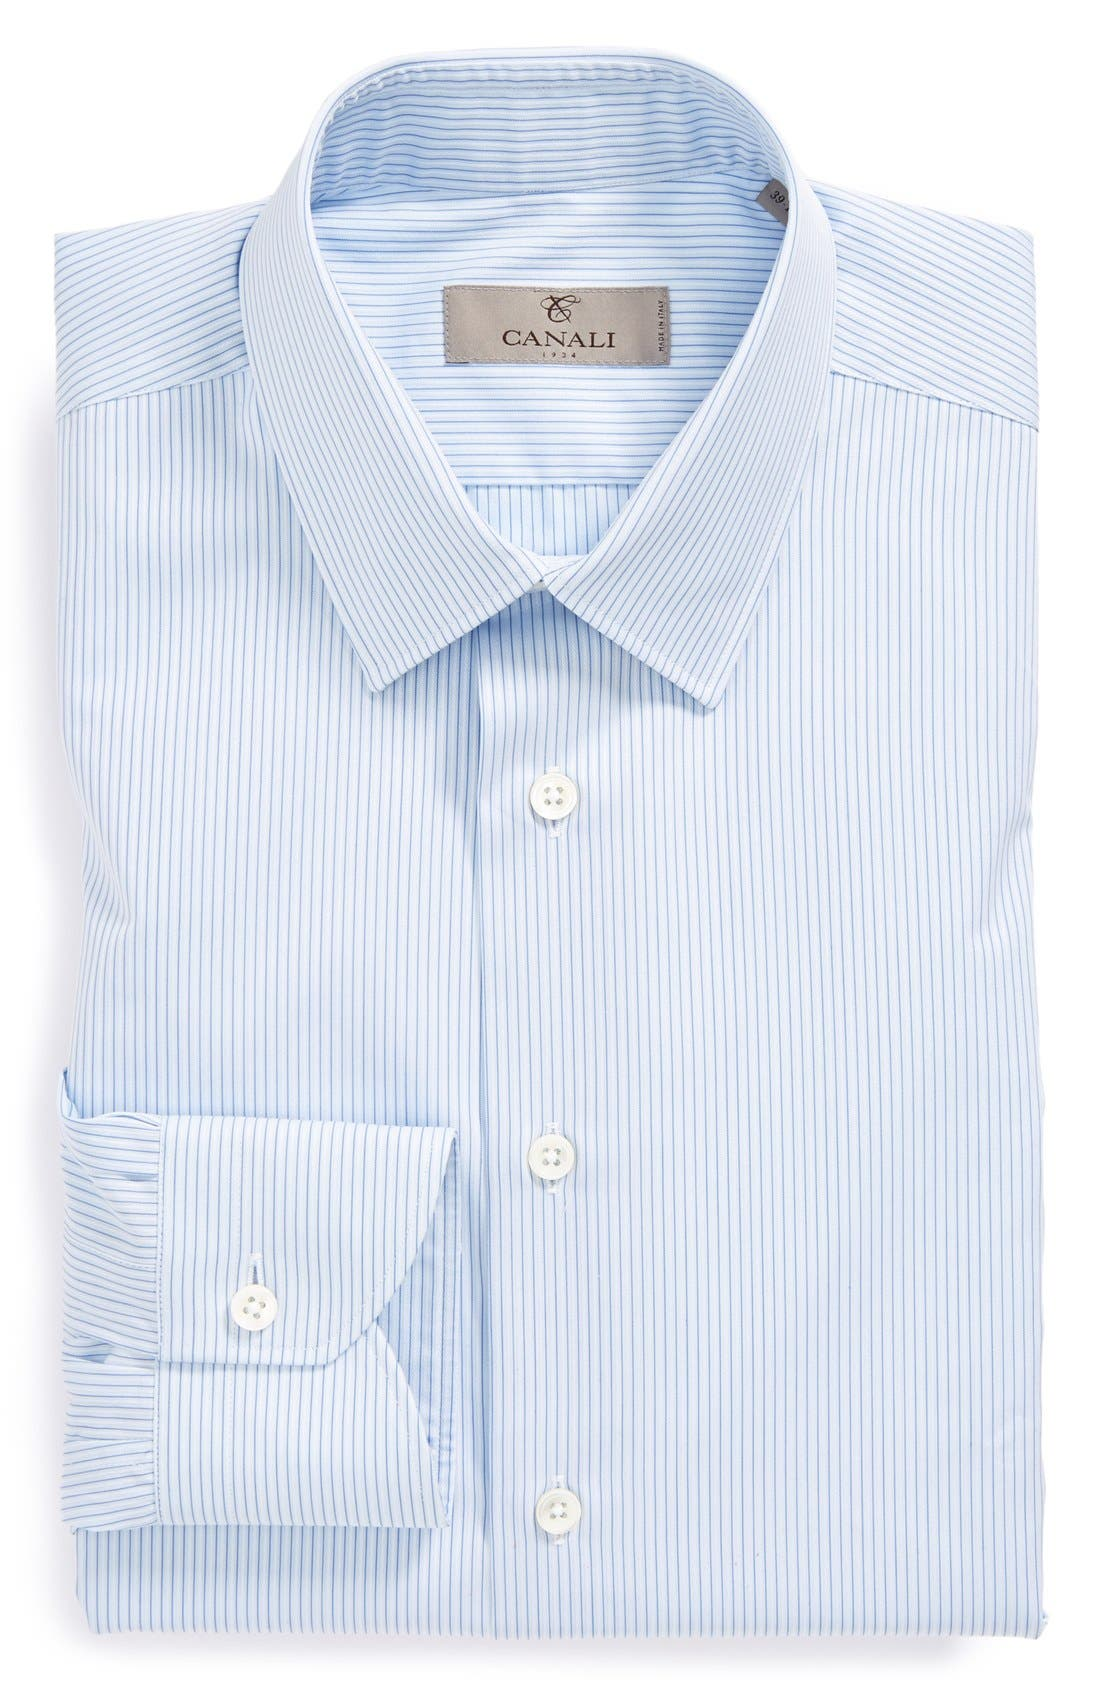 Regular Fit Stripe Dress Shirt,                         Main,                         color,